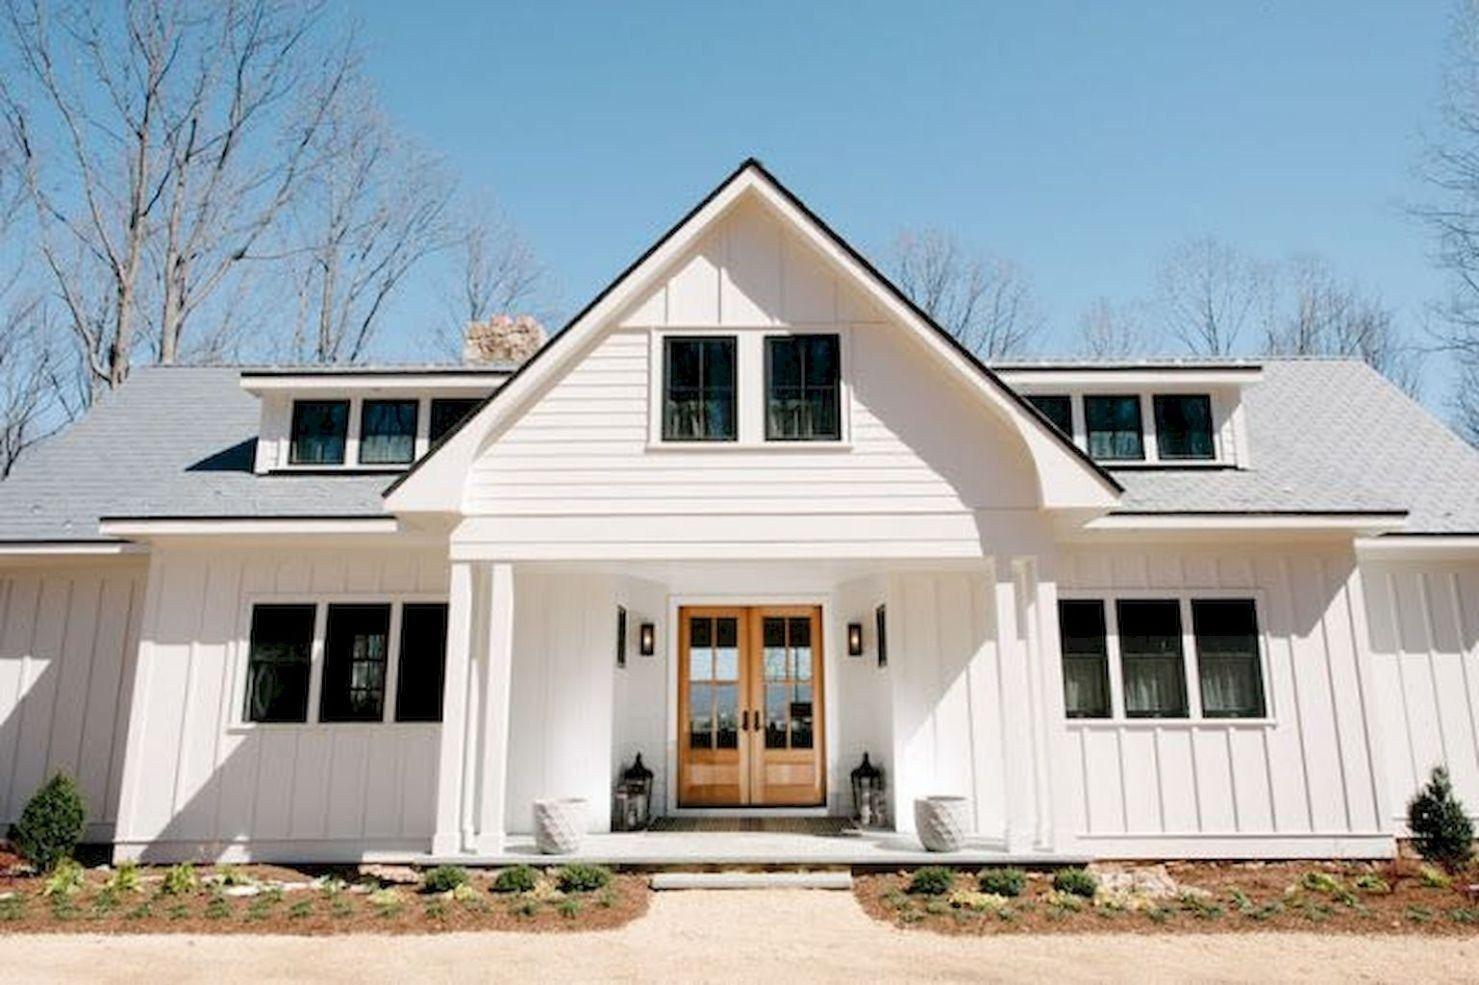 22 Affordable Farmhouse Exterior Designs Ideas Modern Farmhouse Exterior House Designs Exterior Farmhouse Exterior